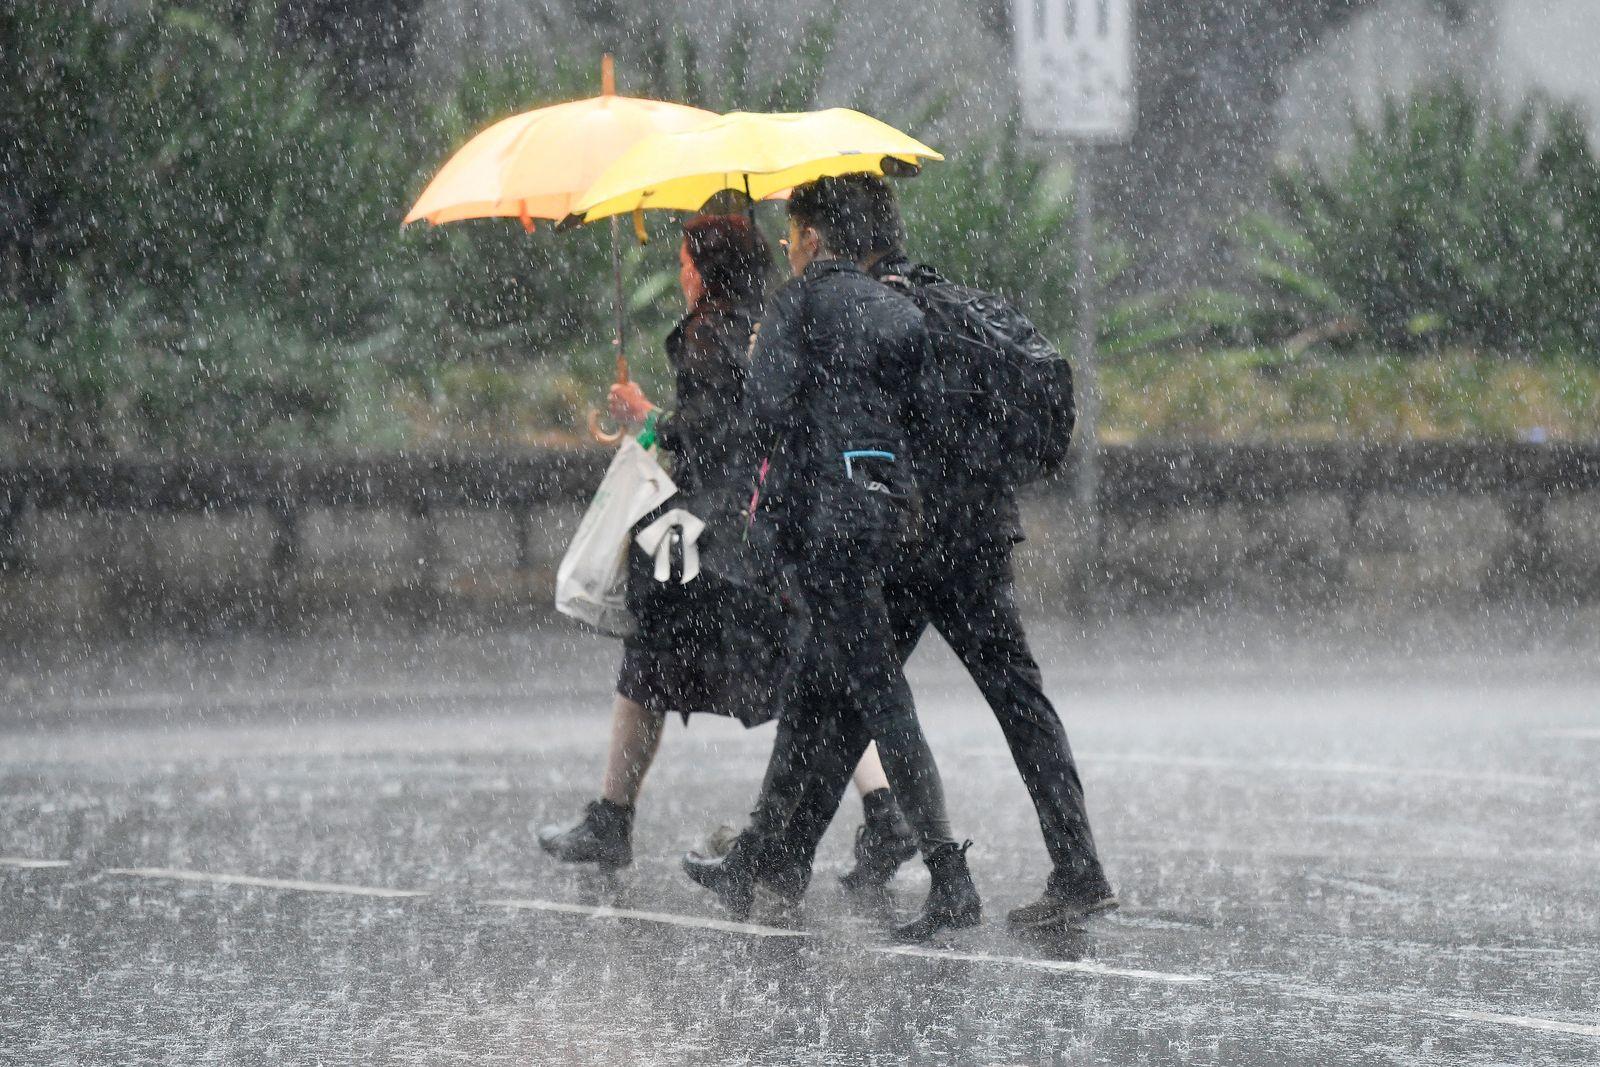 Pedestrians hold umbrellas as they walk in heavy rain in Sydney's CBD